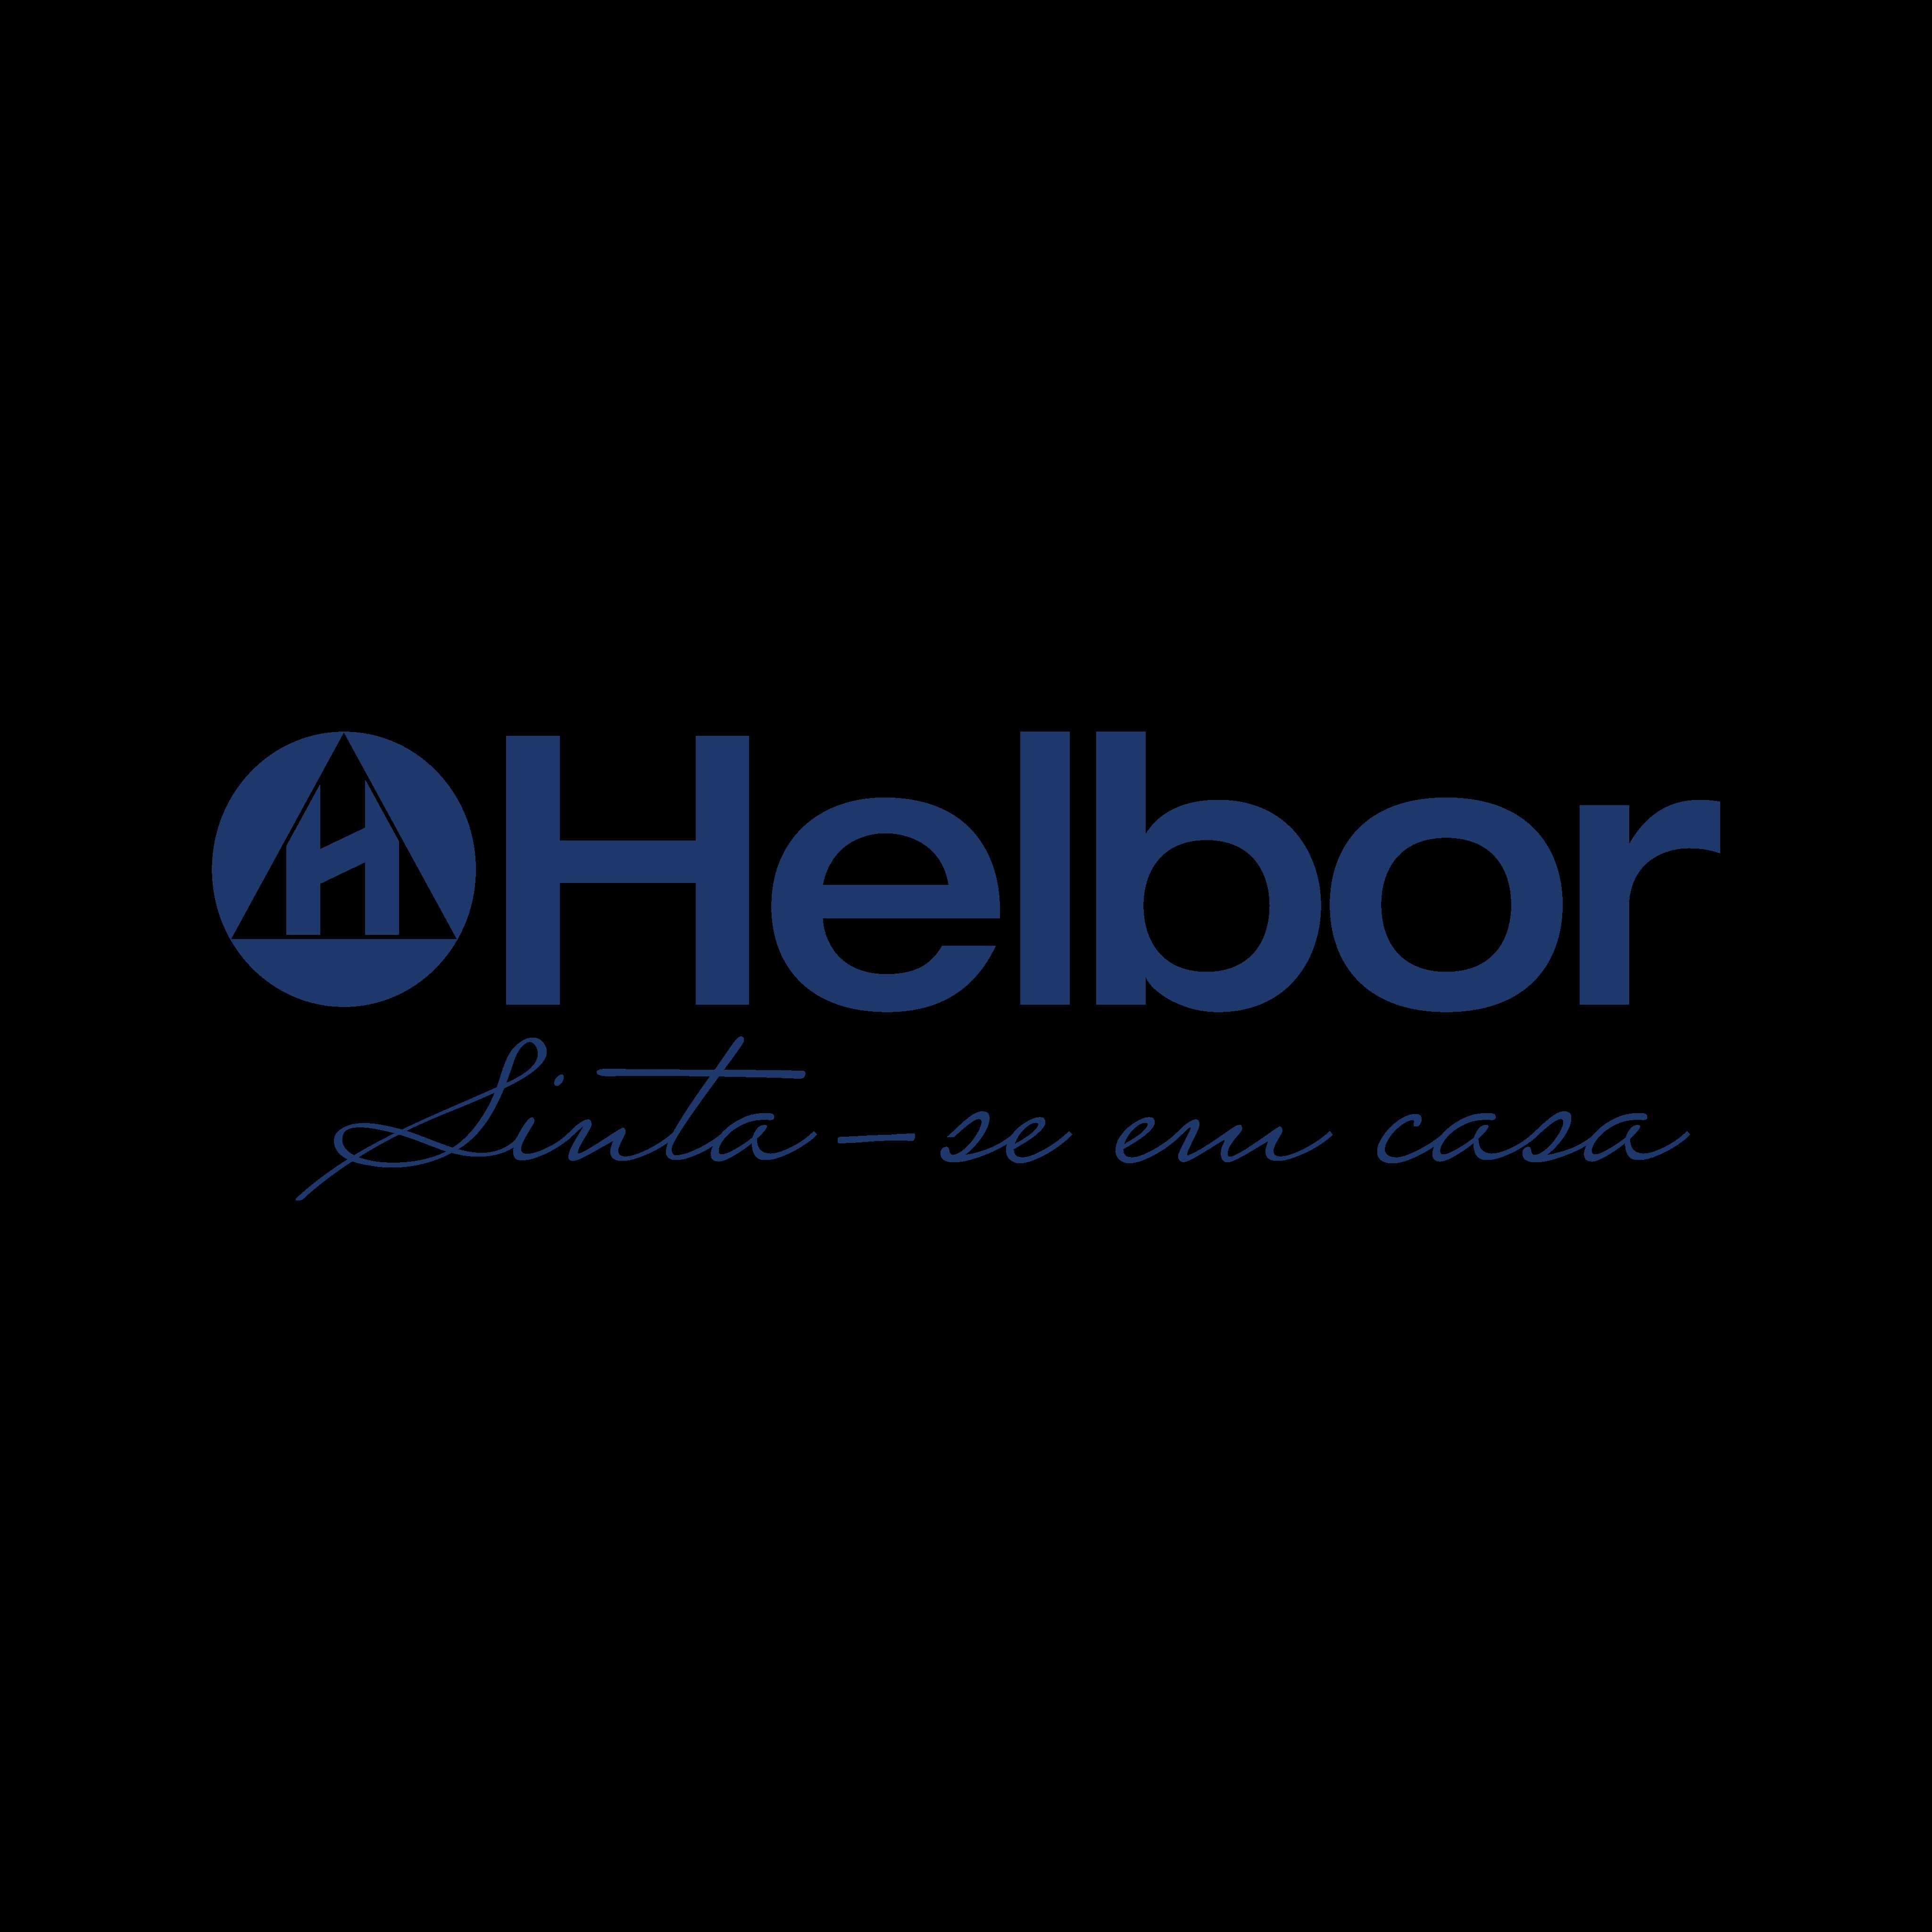 helbor logo 0 - Helbor Logo